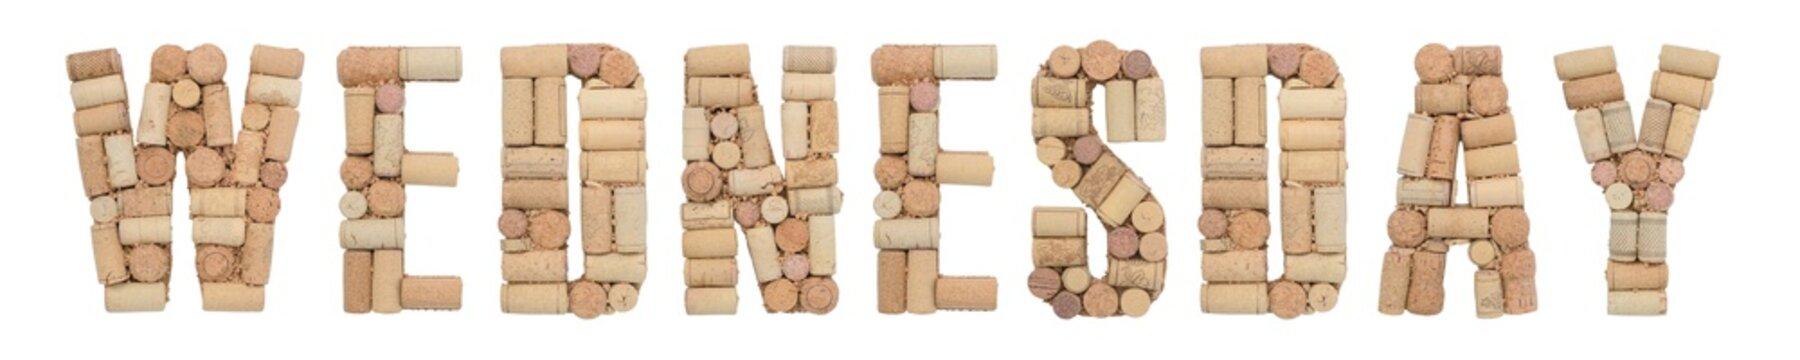 Wednesday made of wine corks Isolated on white background